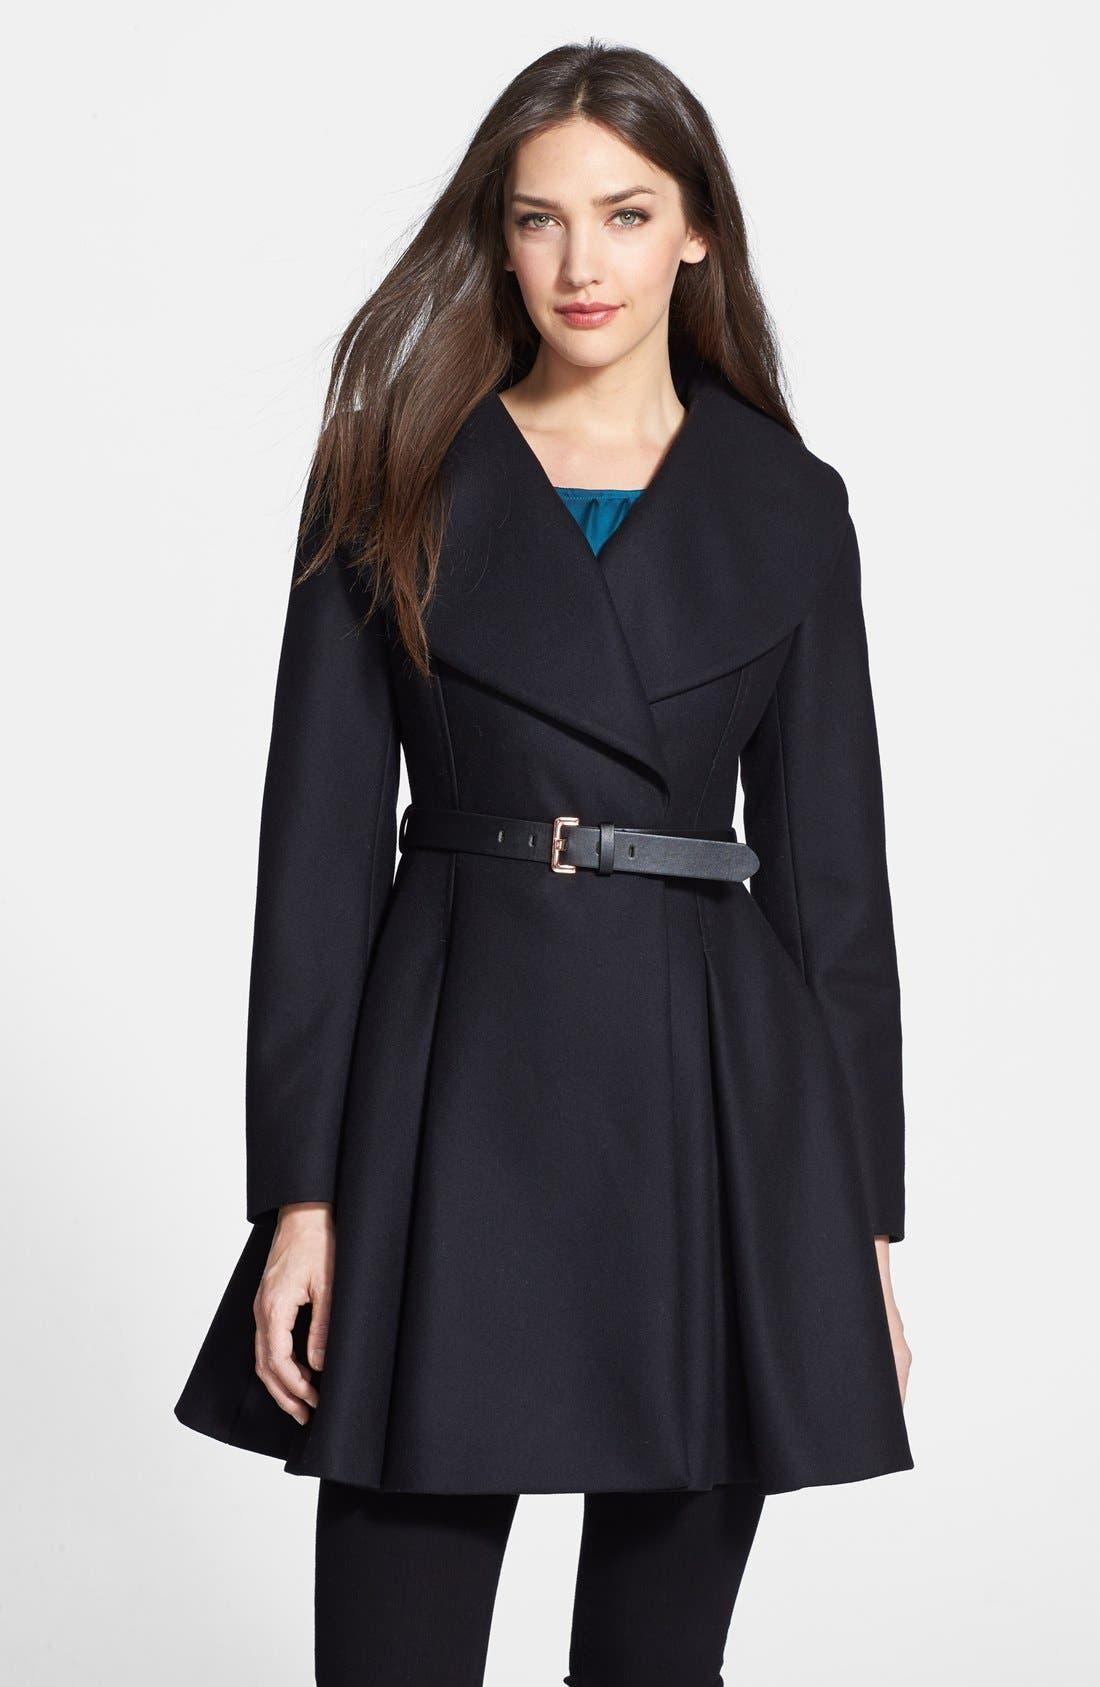 Alternate Image 1 Selected - Ted Baker London Belted Flare Skirt Wool & Cashmere Blend Coat